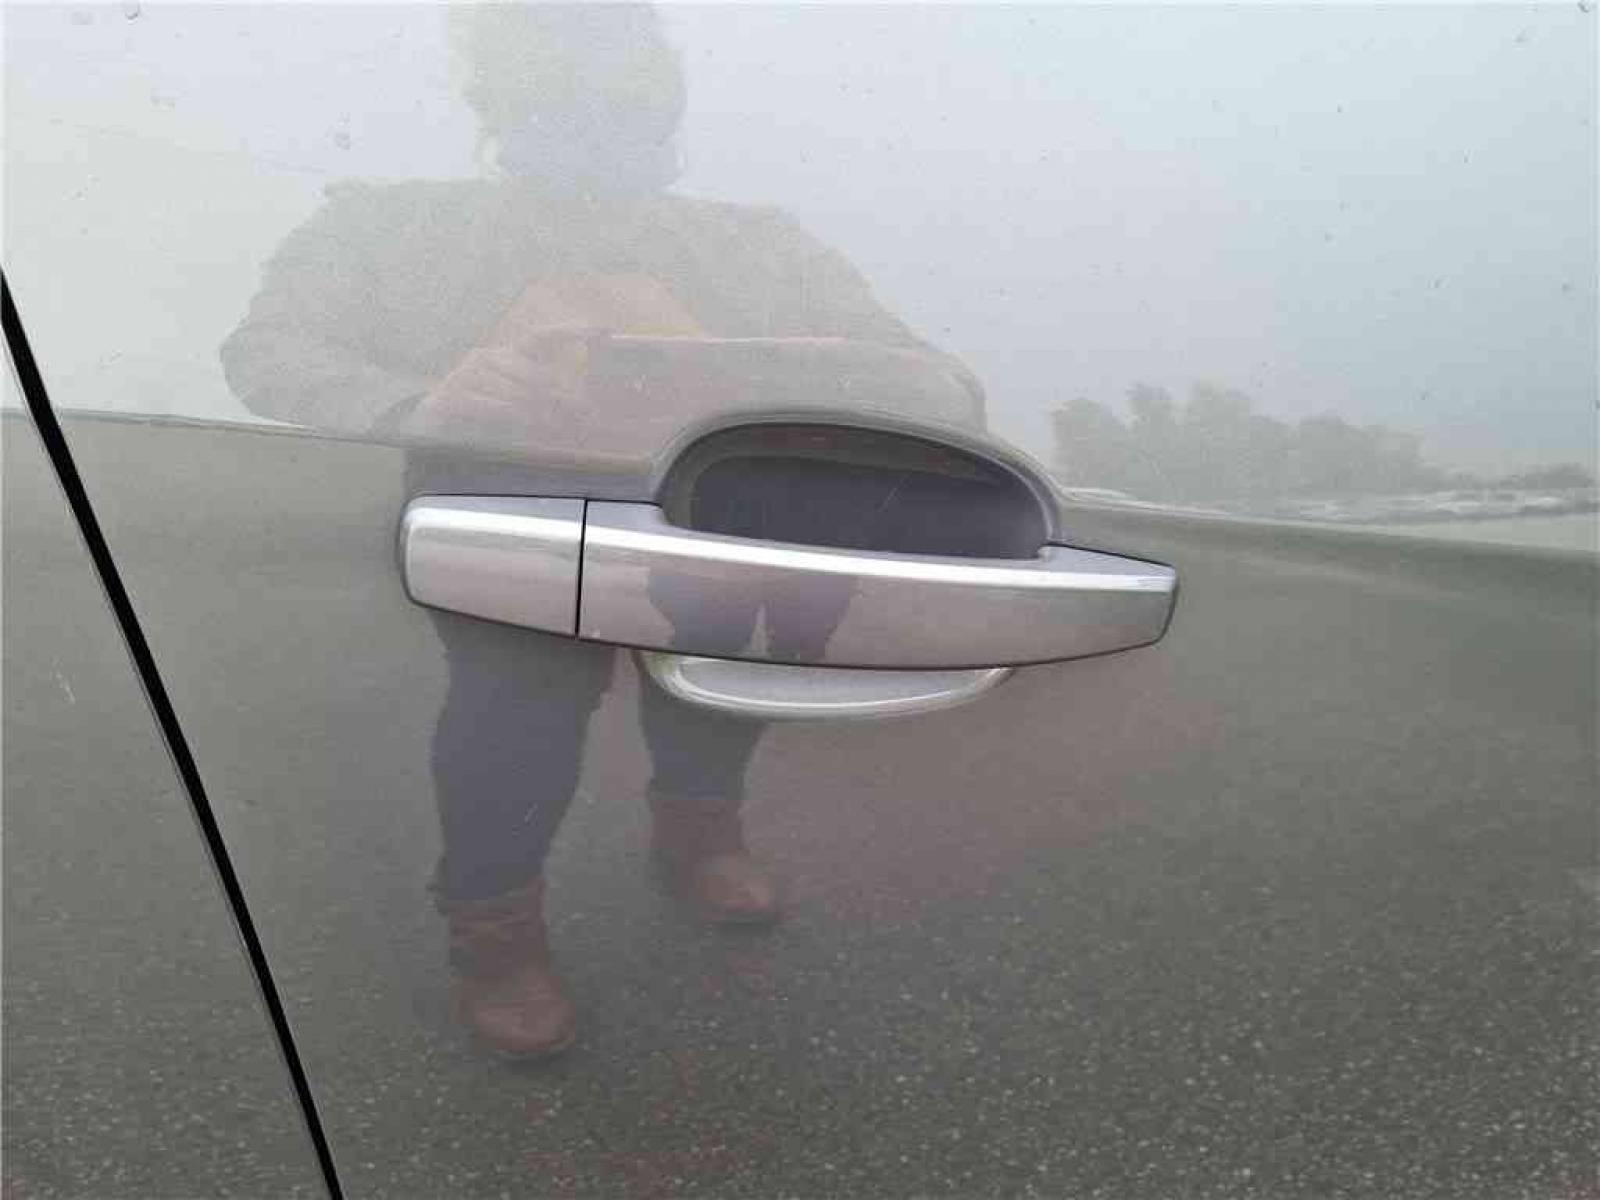 OPEL Meriva 1.6 CDTI - 110 ch Start/Stop - véhicule d'occasion - Groupe Guillet - Opel Magicauto - Chalon-sur-Saône - 71380 - Saint-Marcel - 14